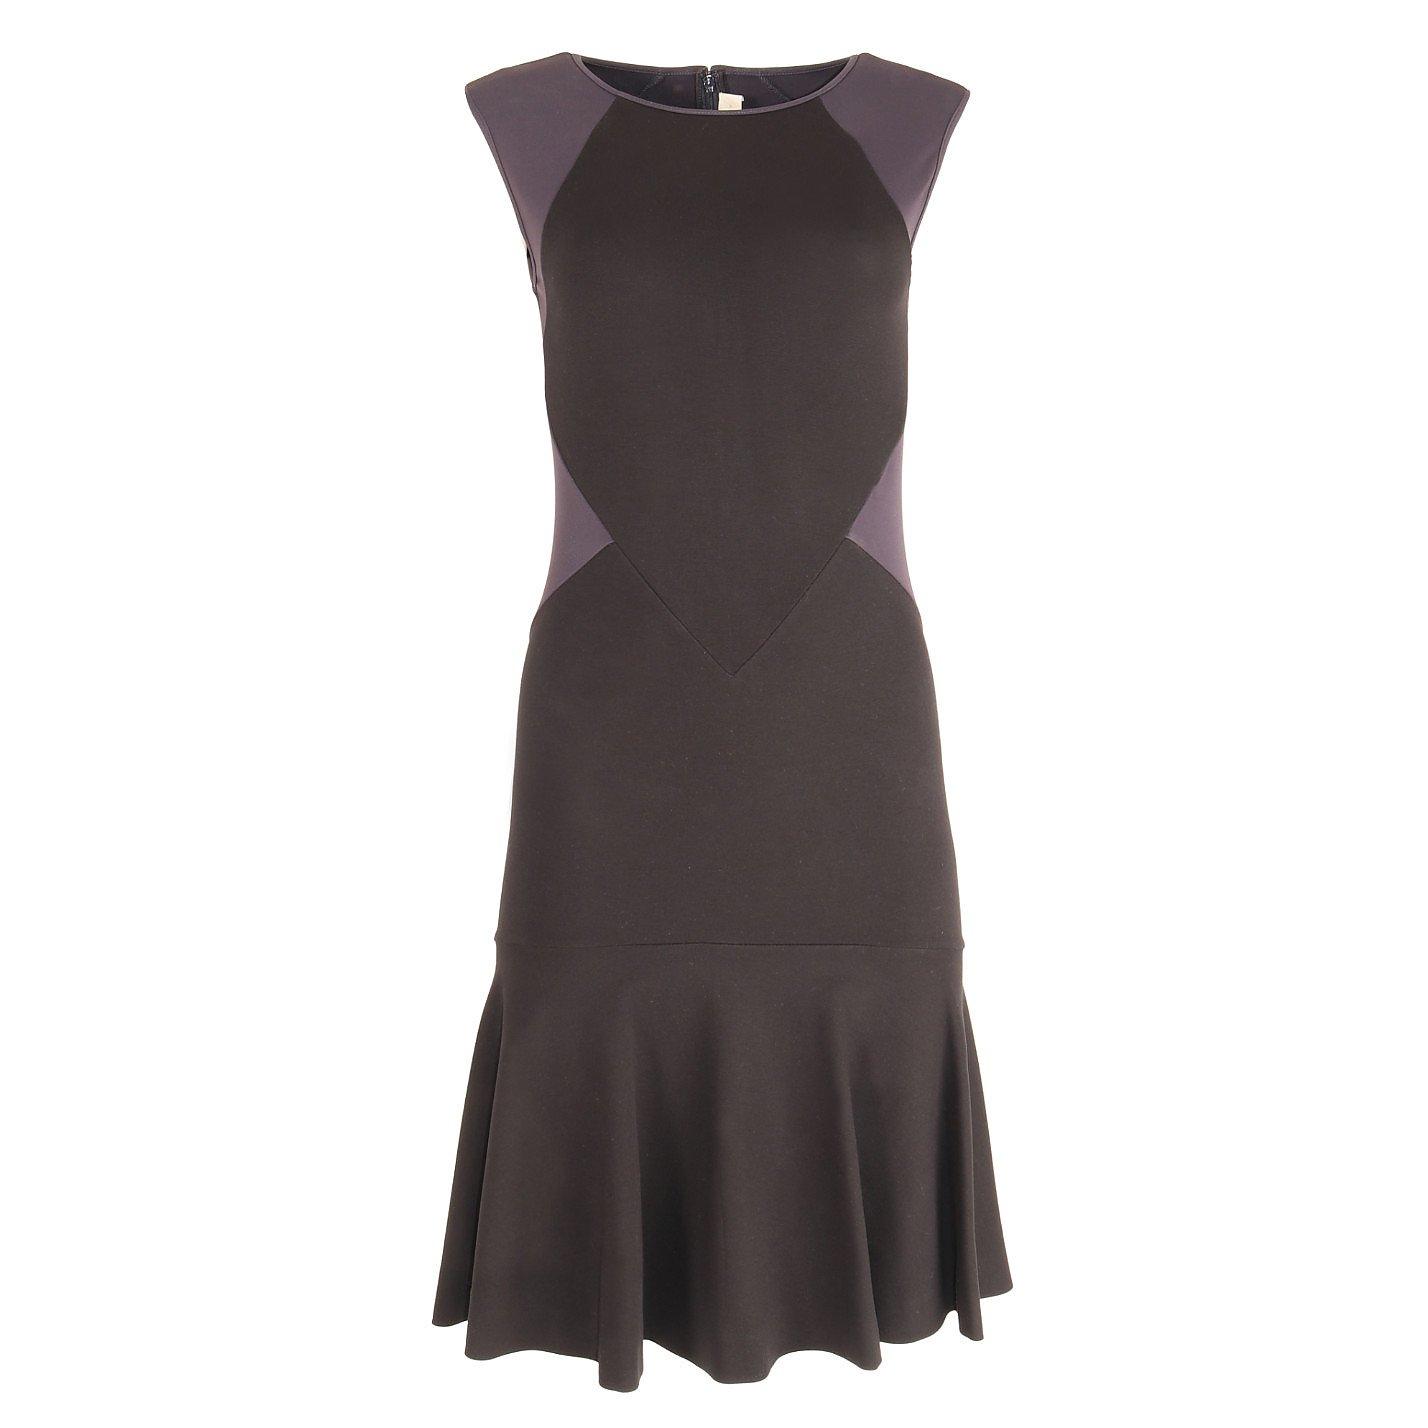 Stella McCartney Stretch Contrast Dress